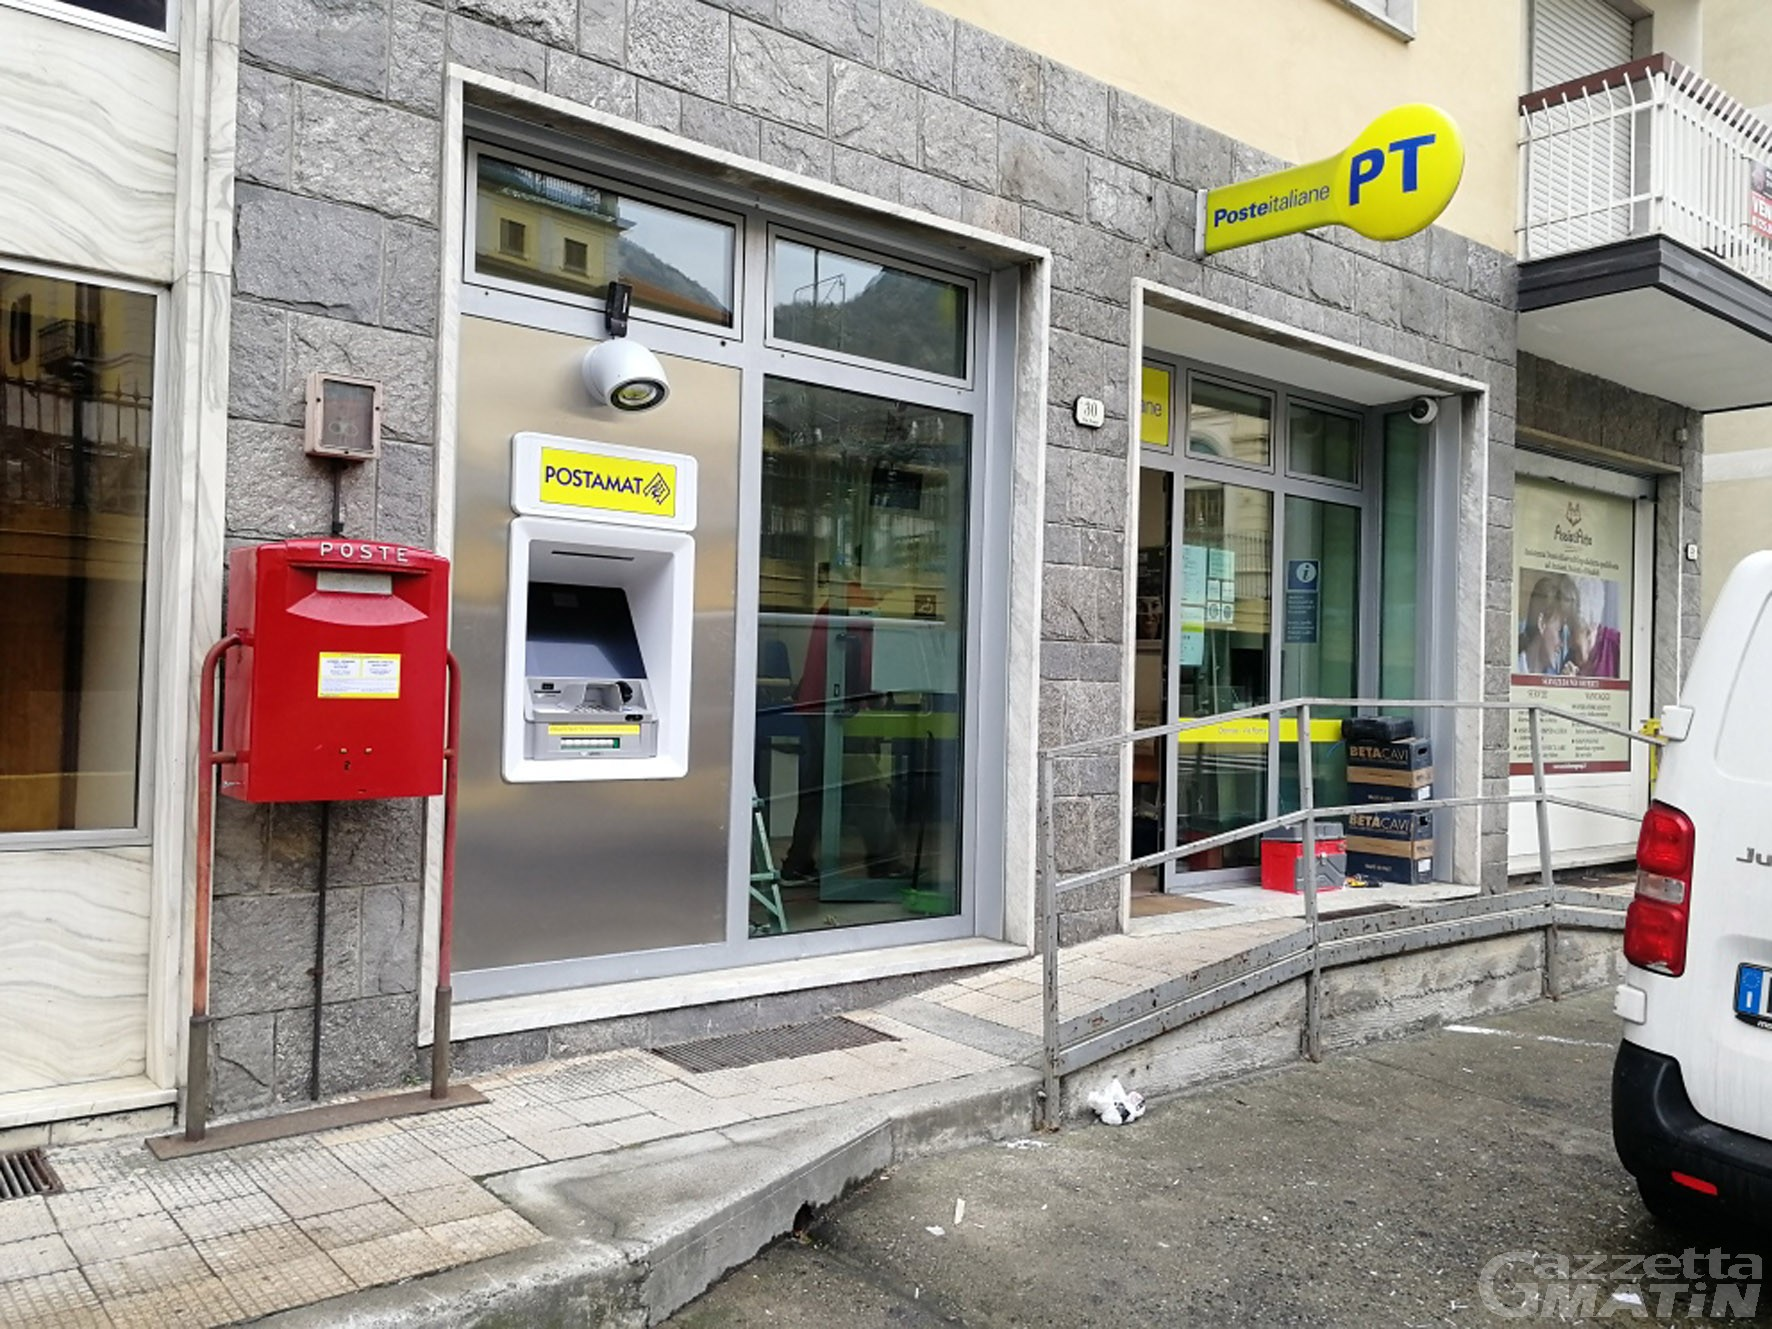 Poste italiane: in funzione 4 nuovi Postamat a Donnas, Arnad, Pontey e Quart